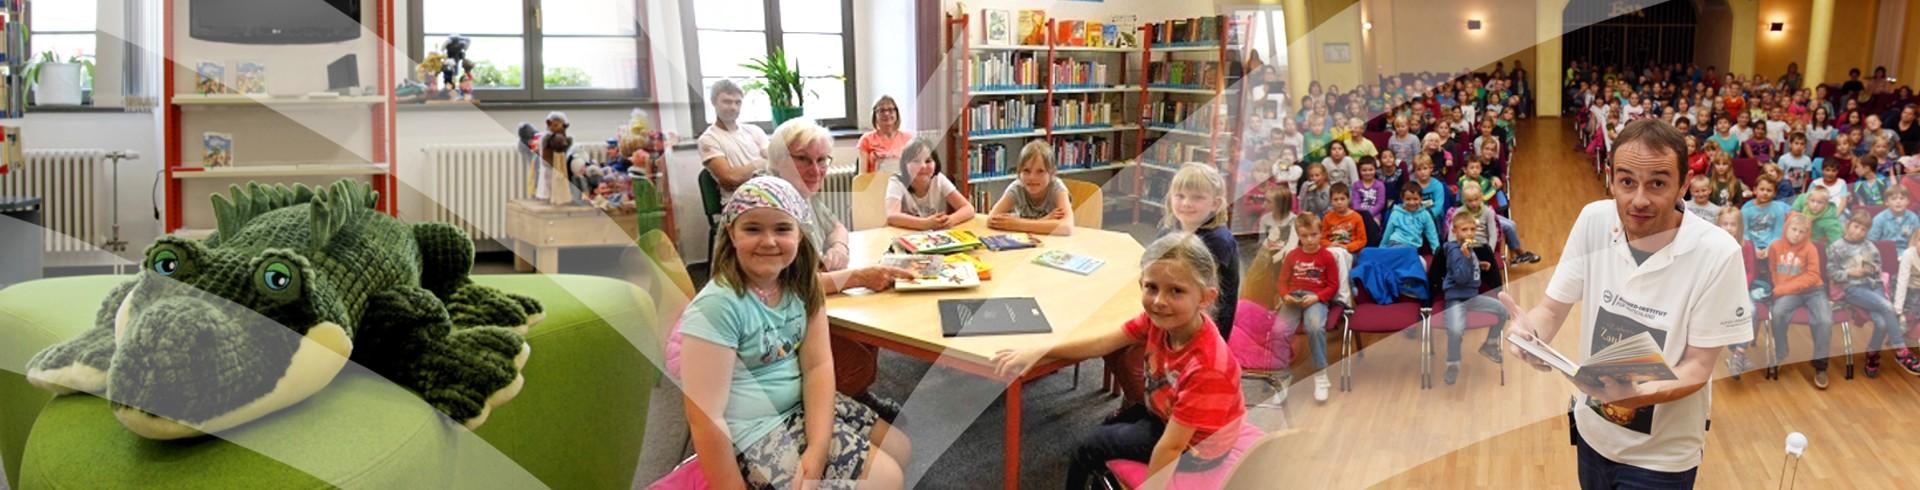 Kulturbetrieb Wurzen Folgeseite Banner Bibliothek